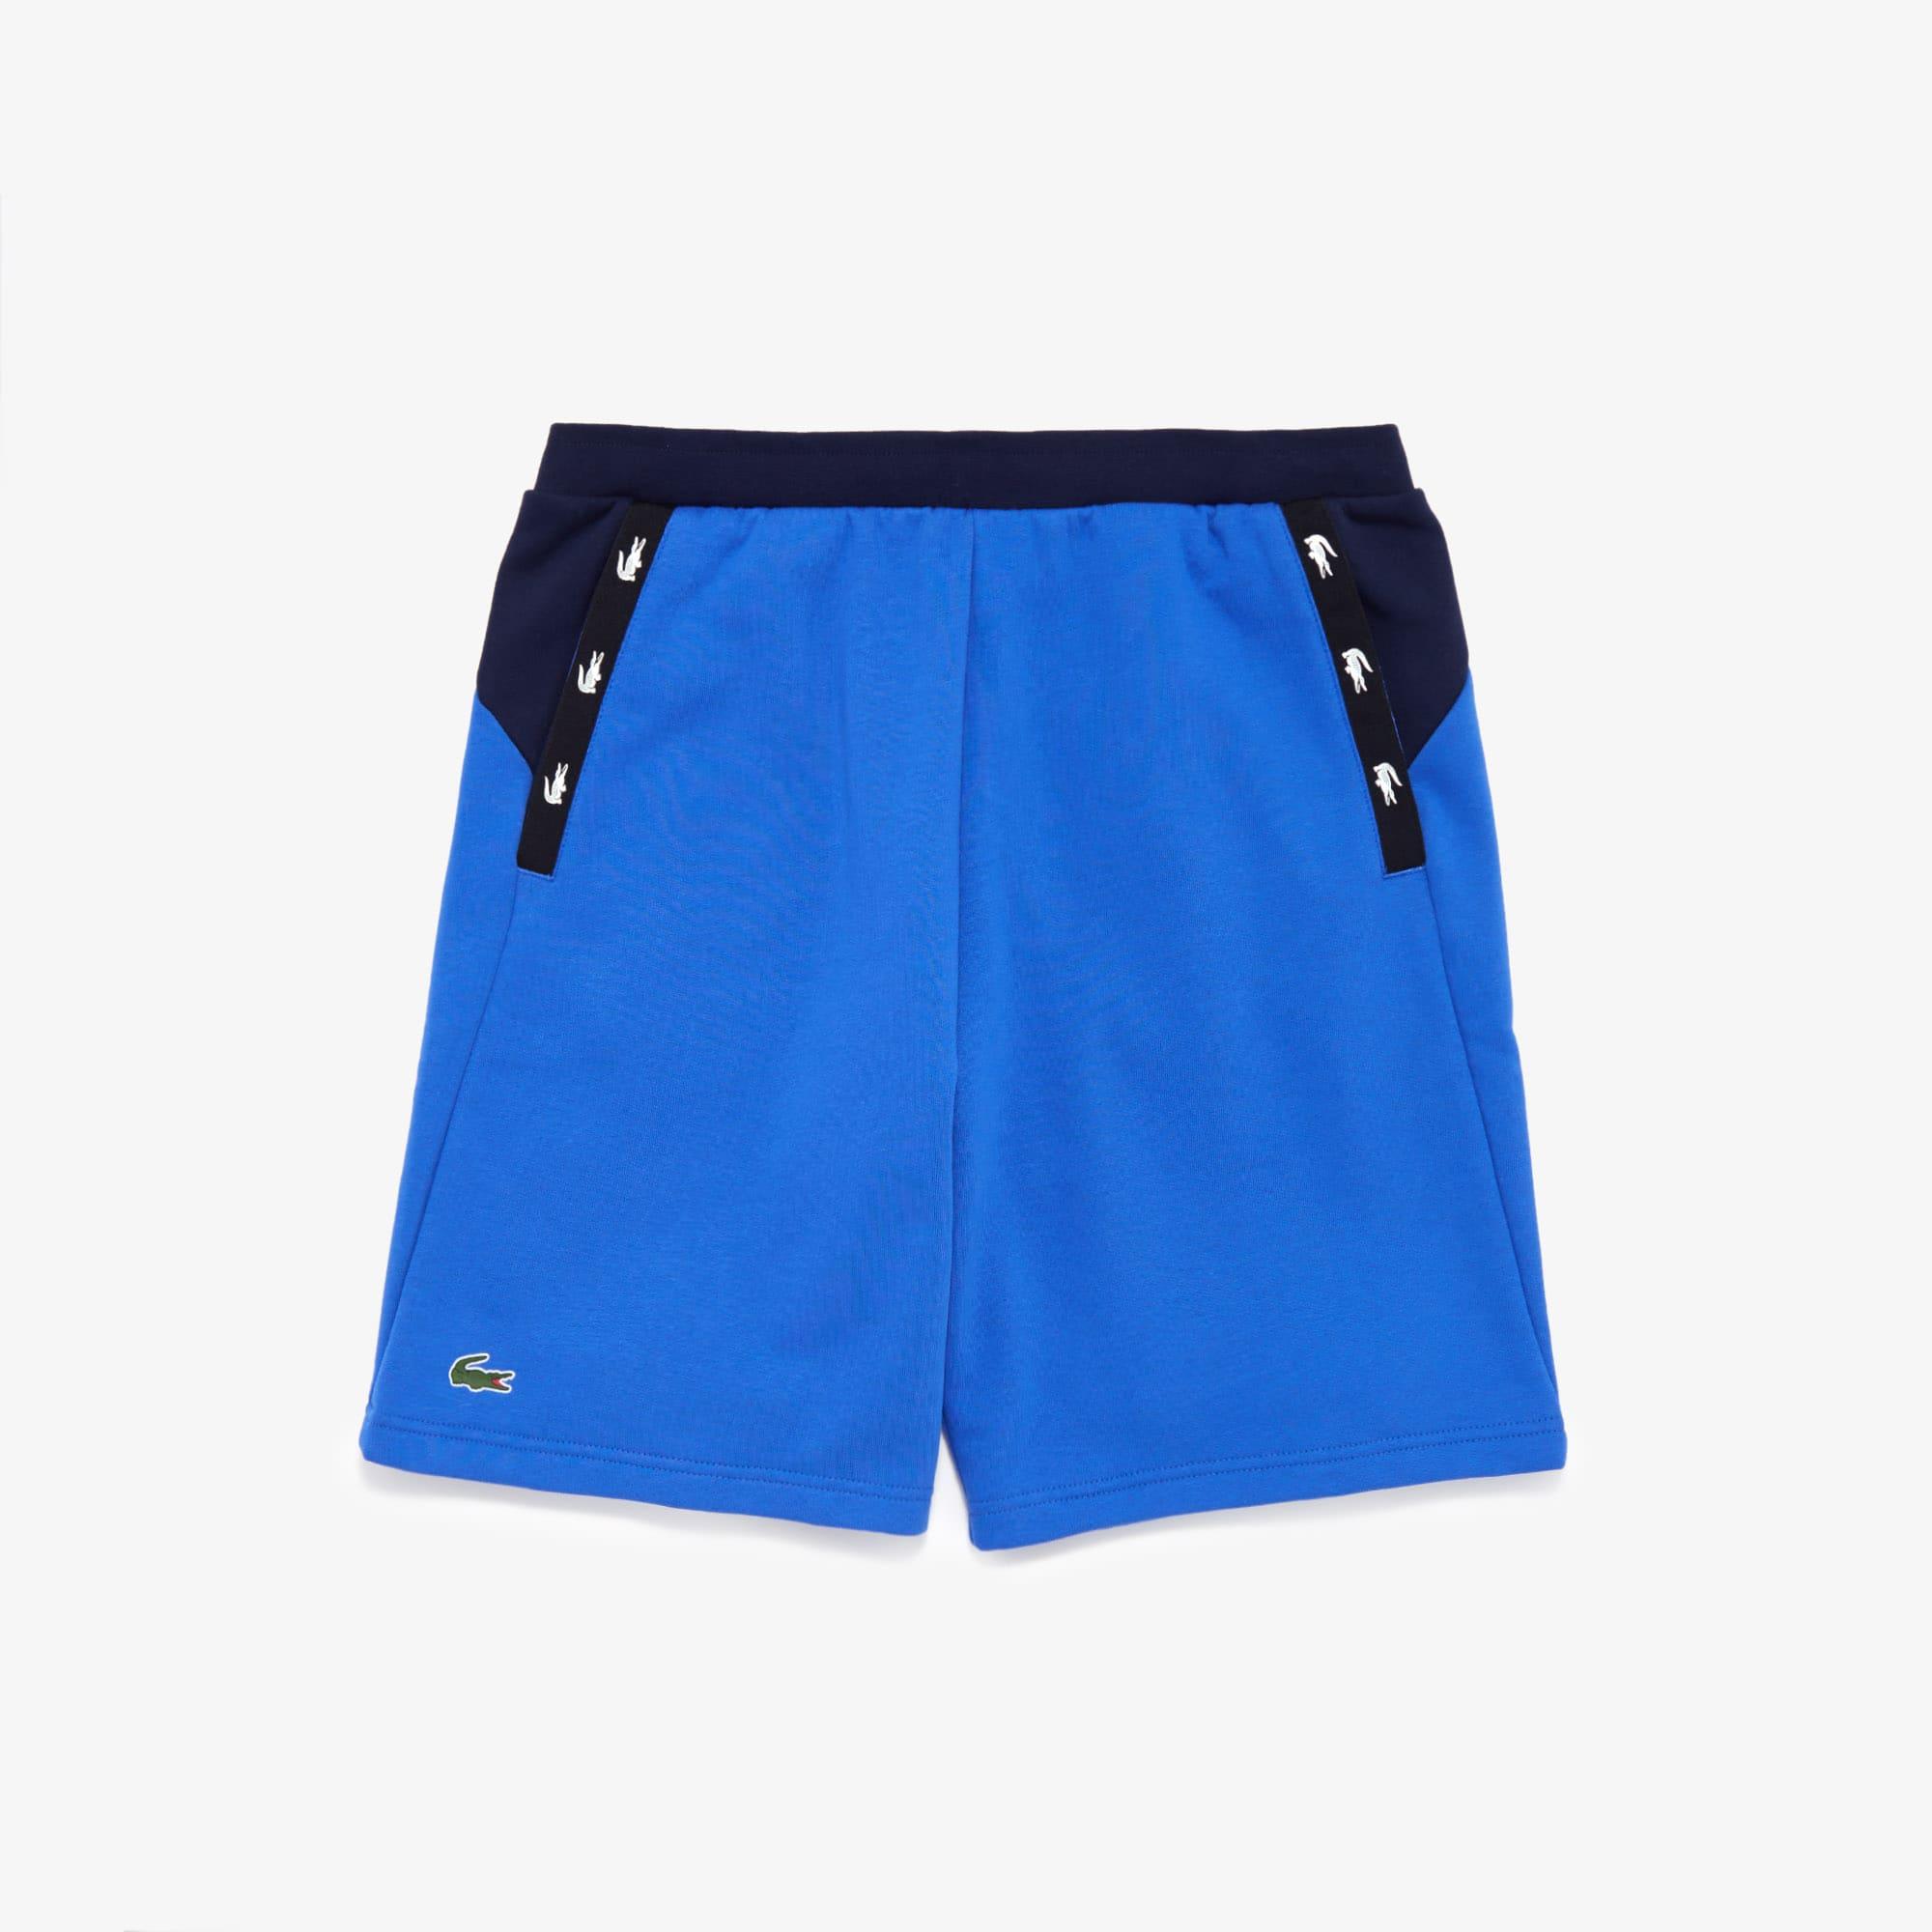 Lacoste Mens SPORT Crocodile Striped Colorblock Fleece Shorts